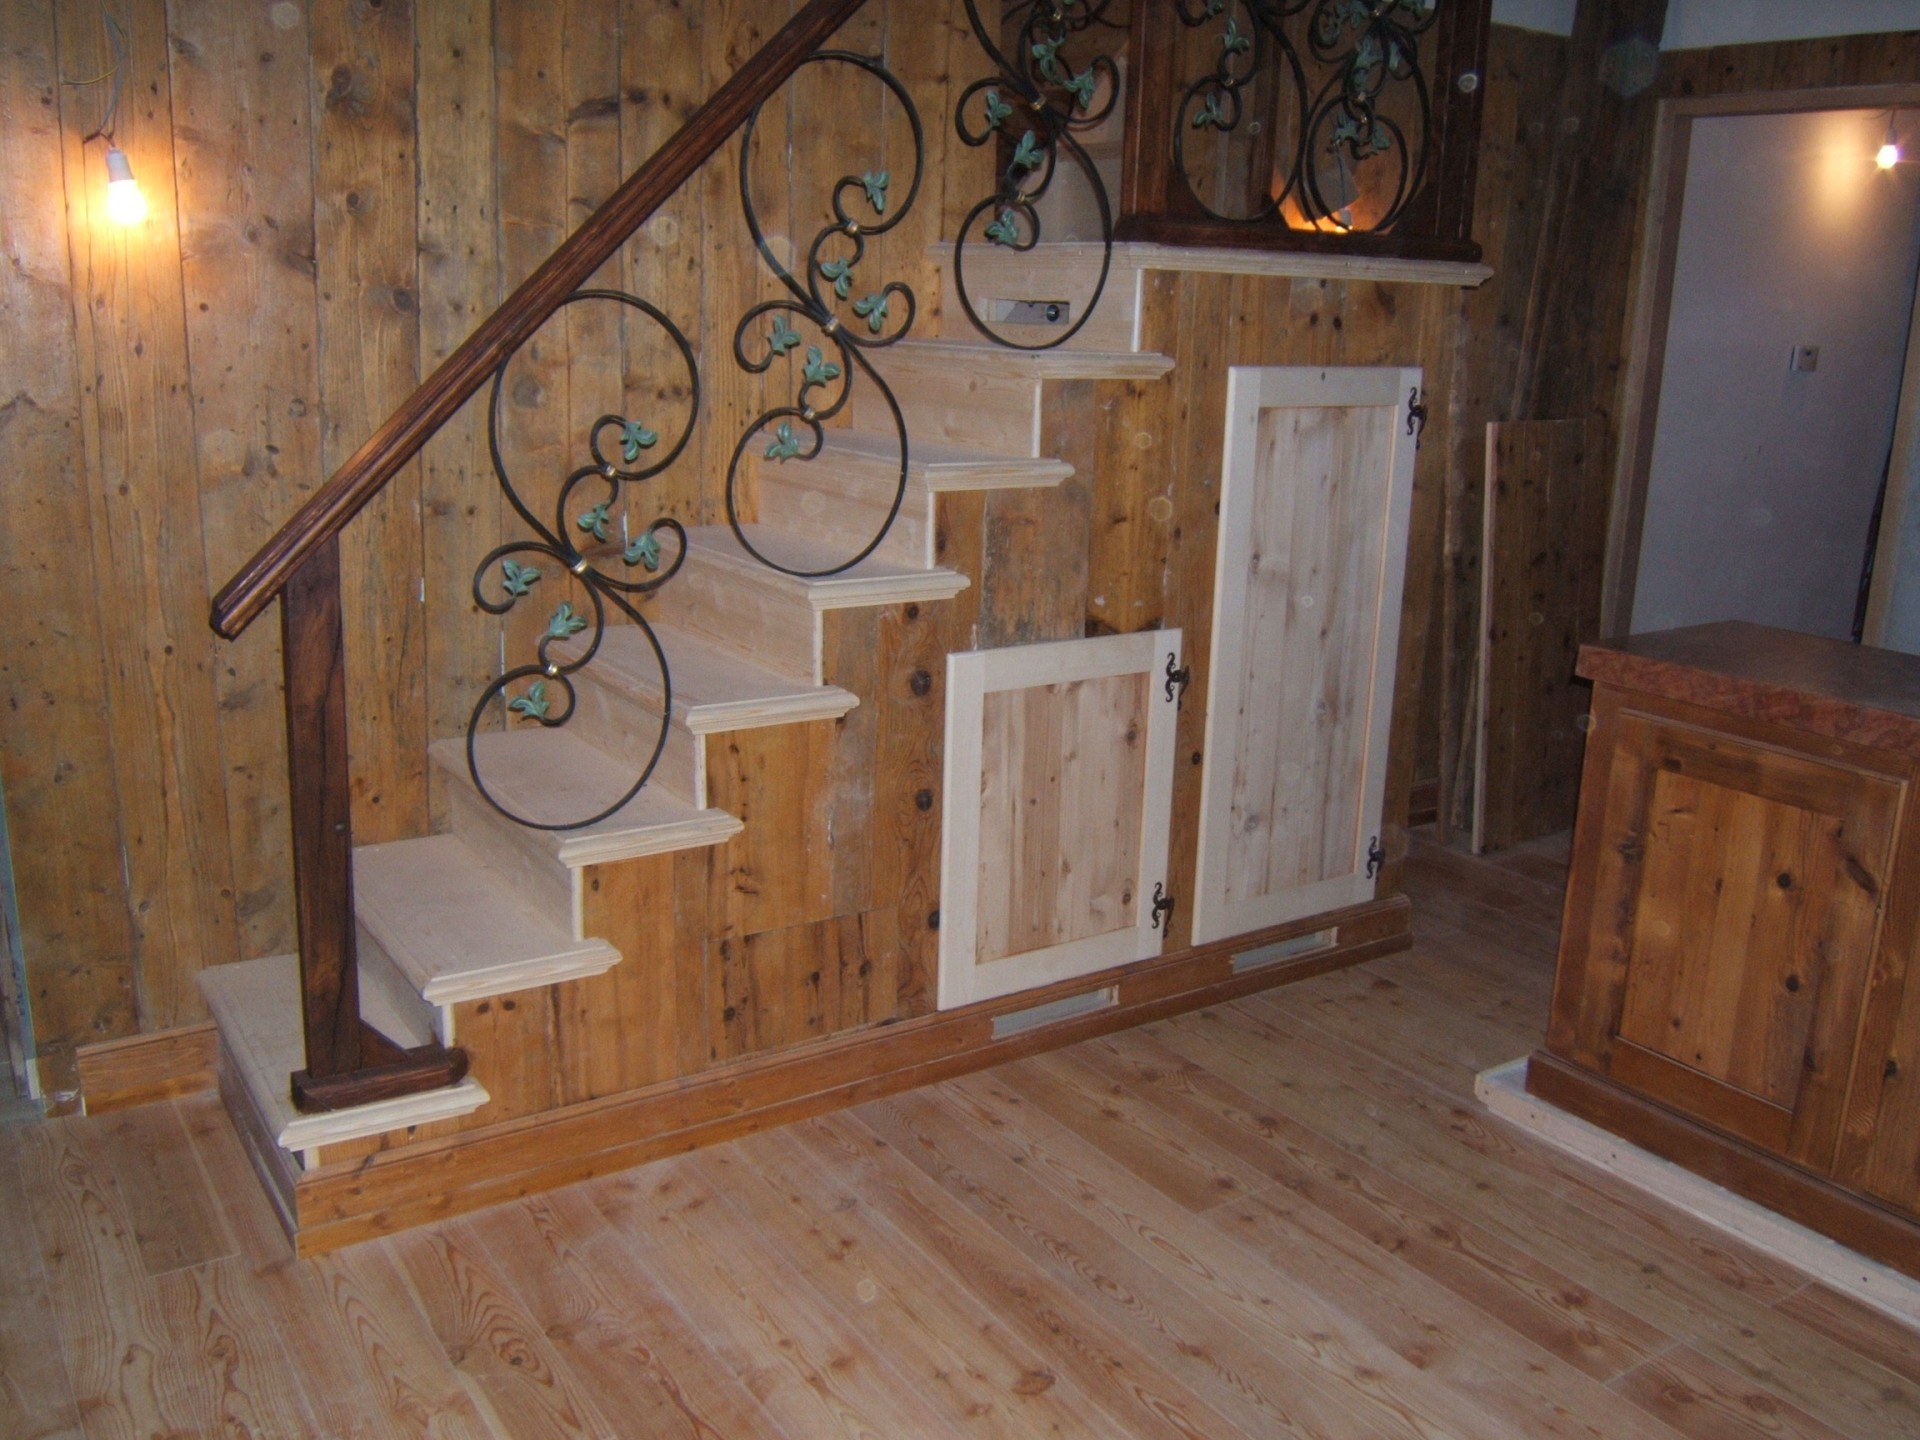 Arredamento rustico per taverna